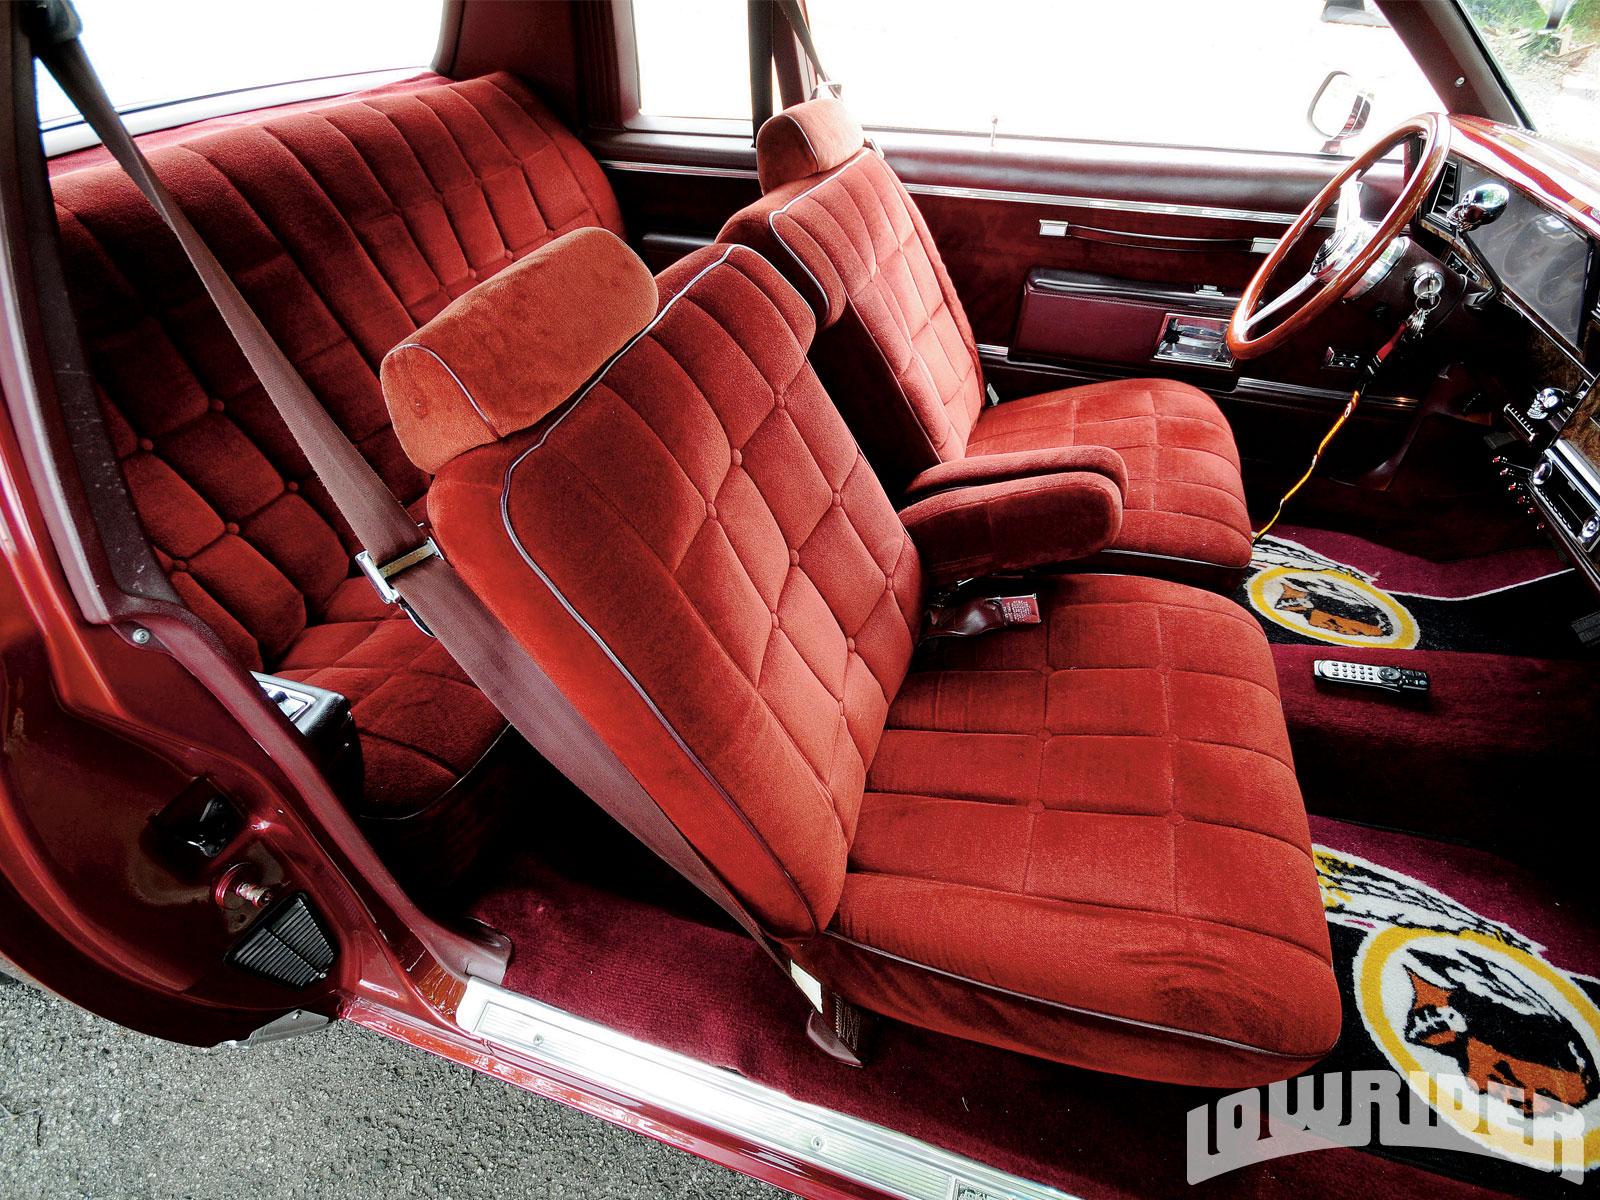 1984 Chevrolet Caprice Classic Landau V8 Chevy 350